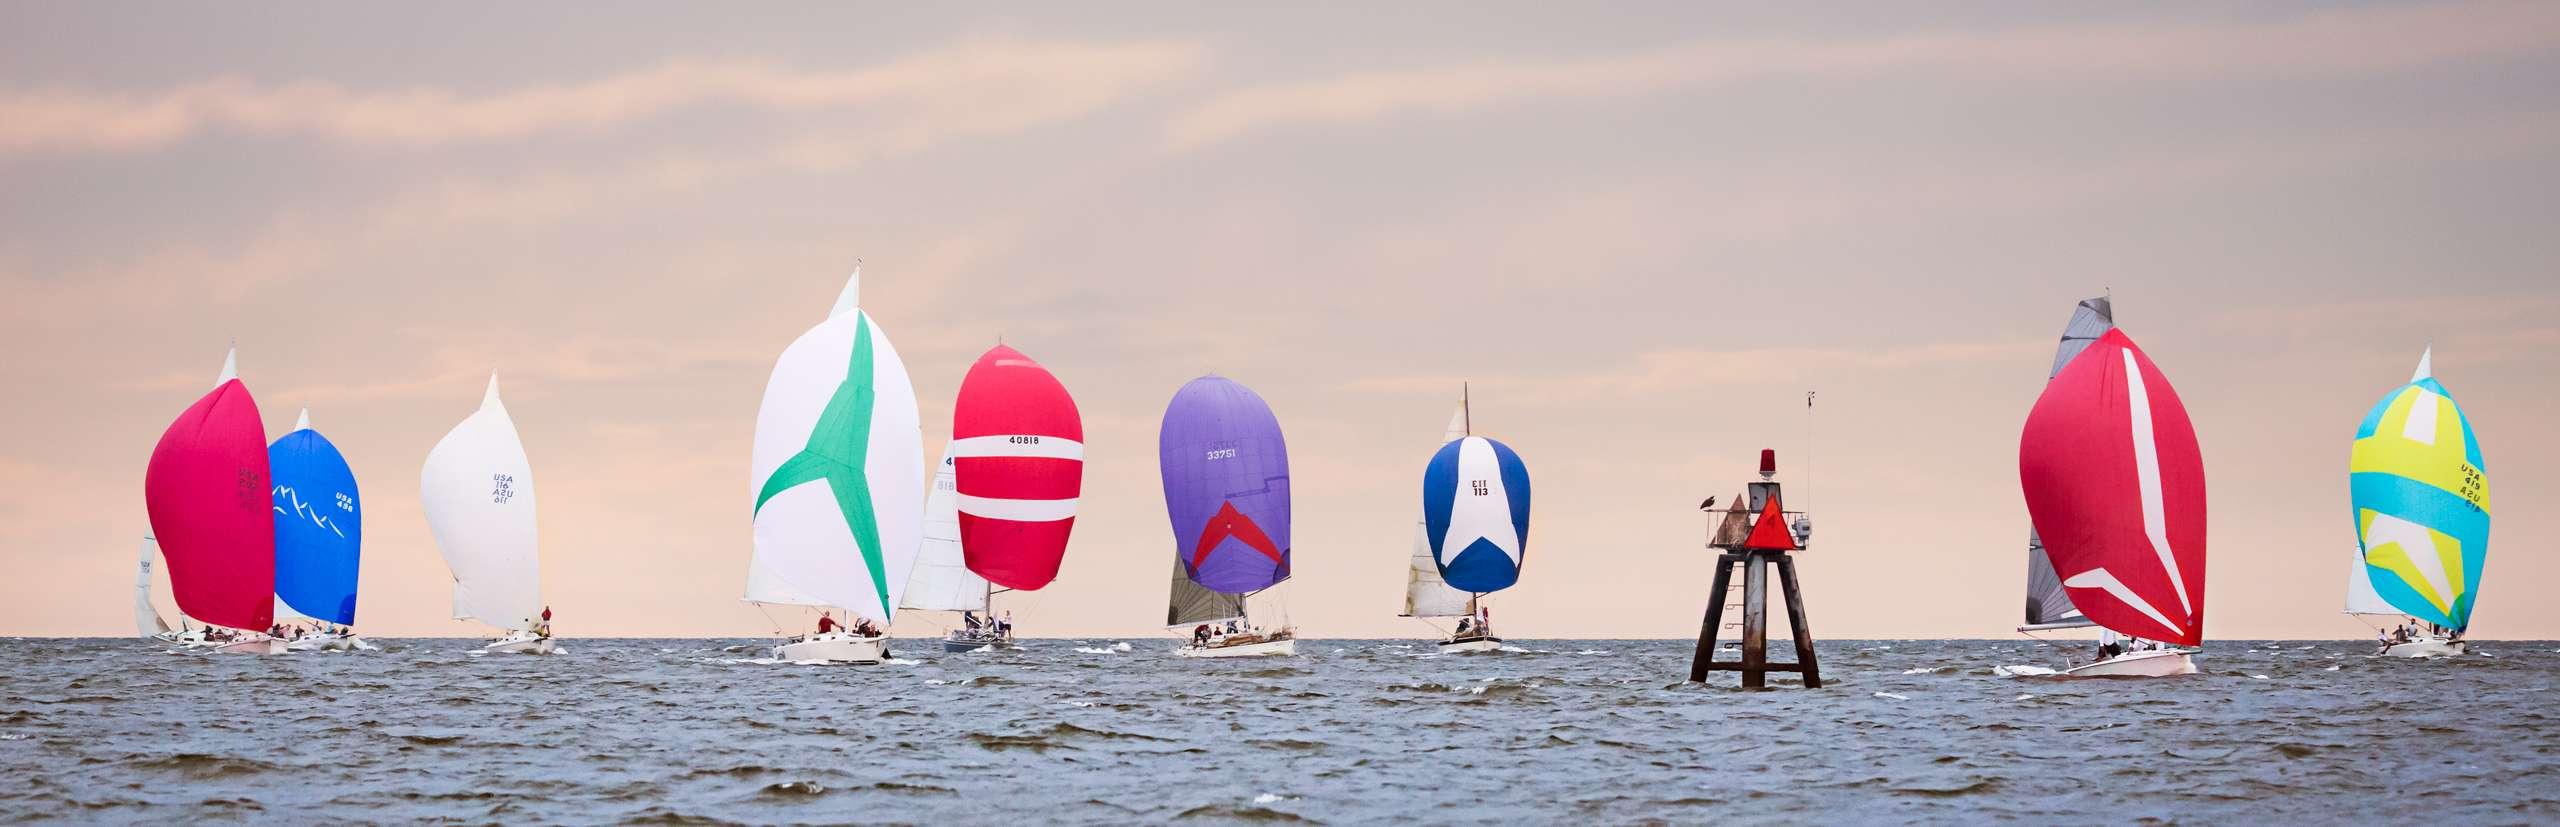 PORTFOLIO - Sailing - Chesapeake #7    PCG753